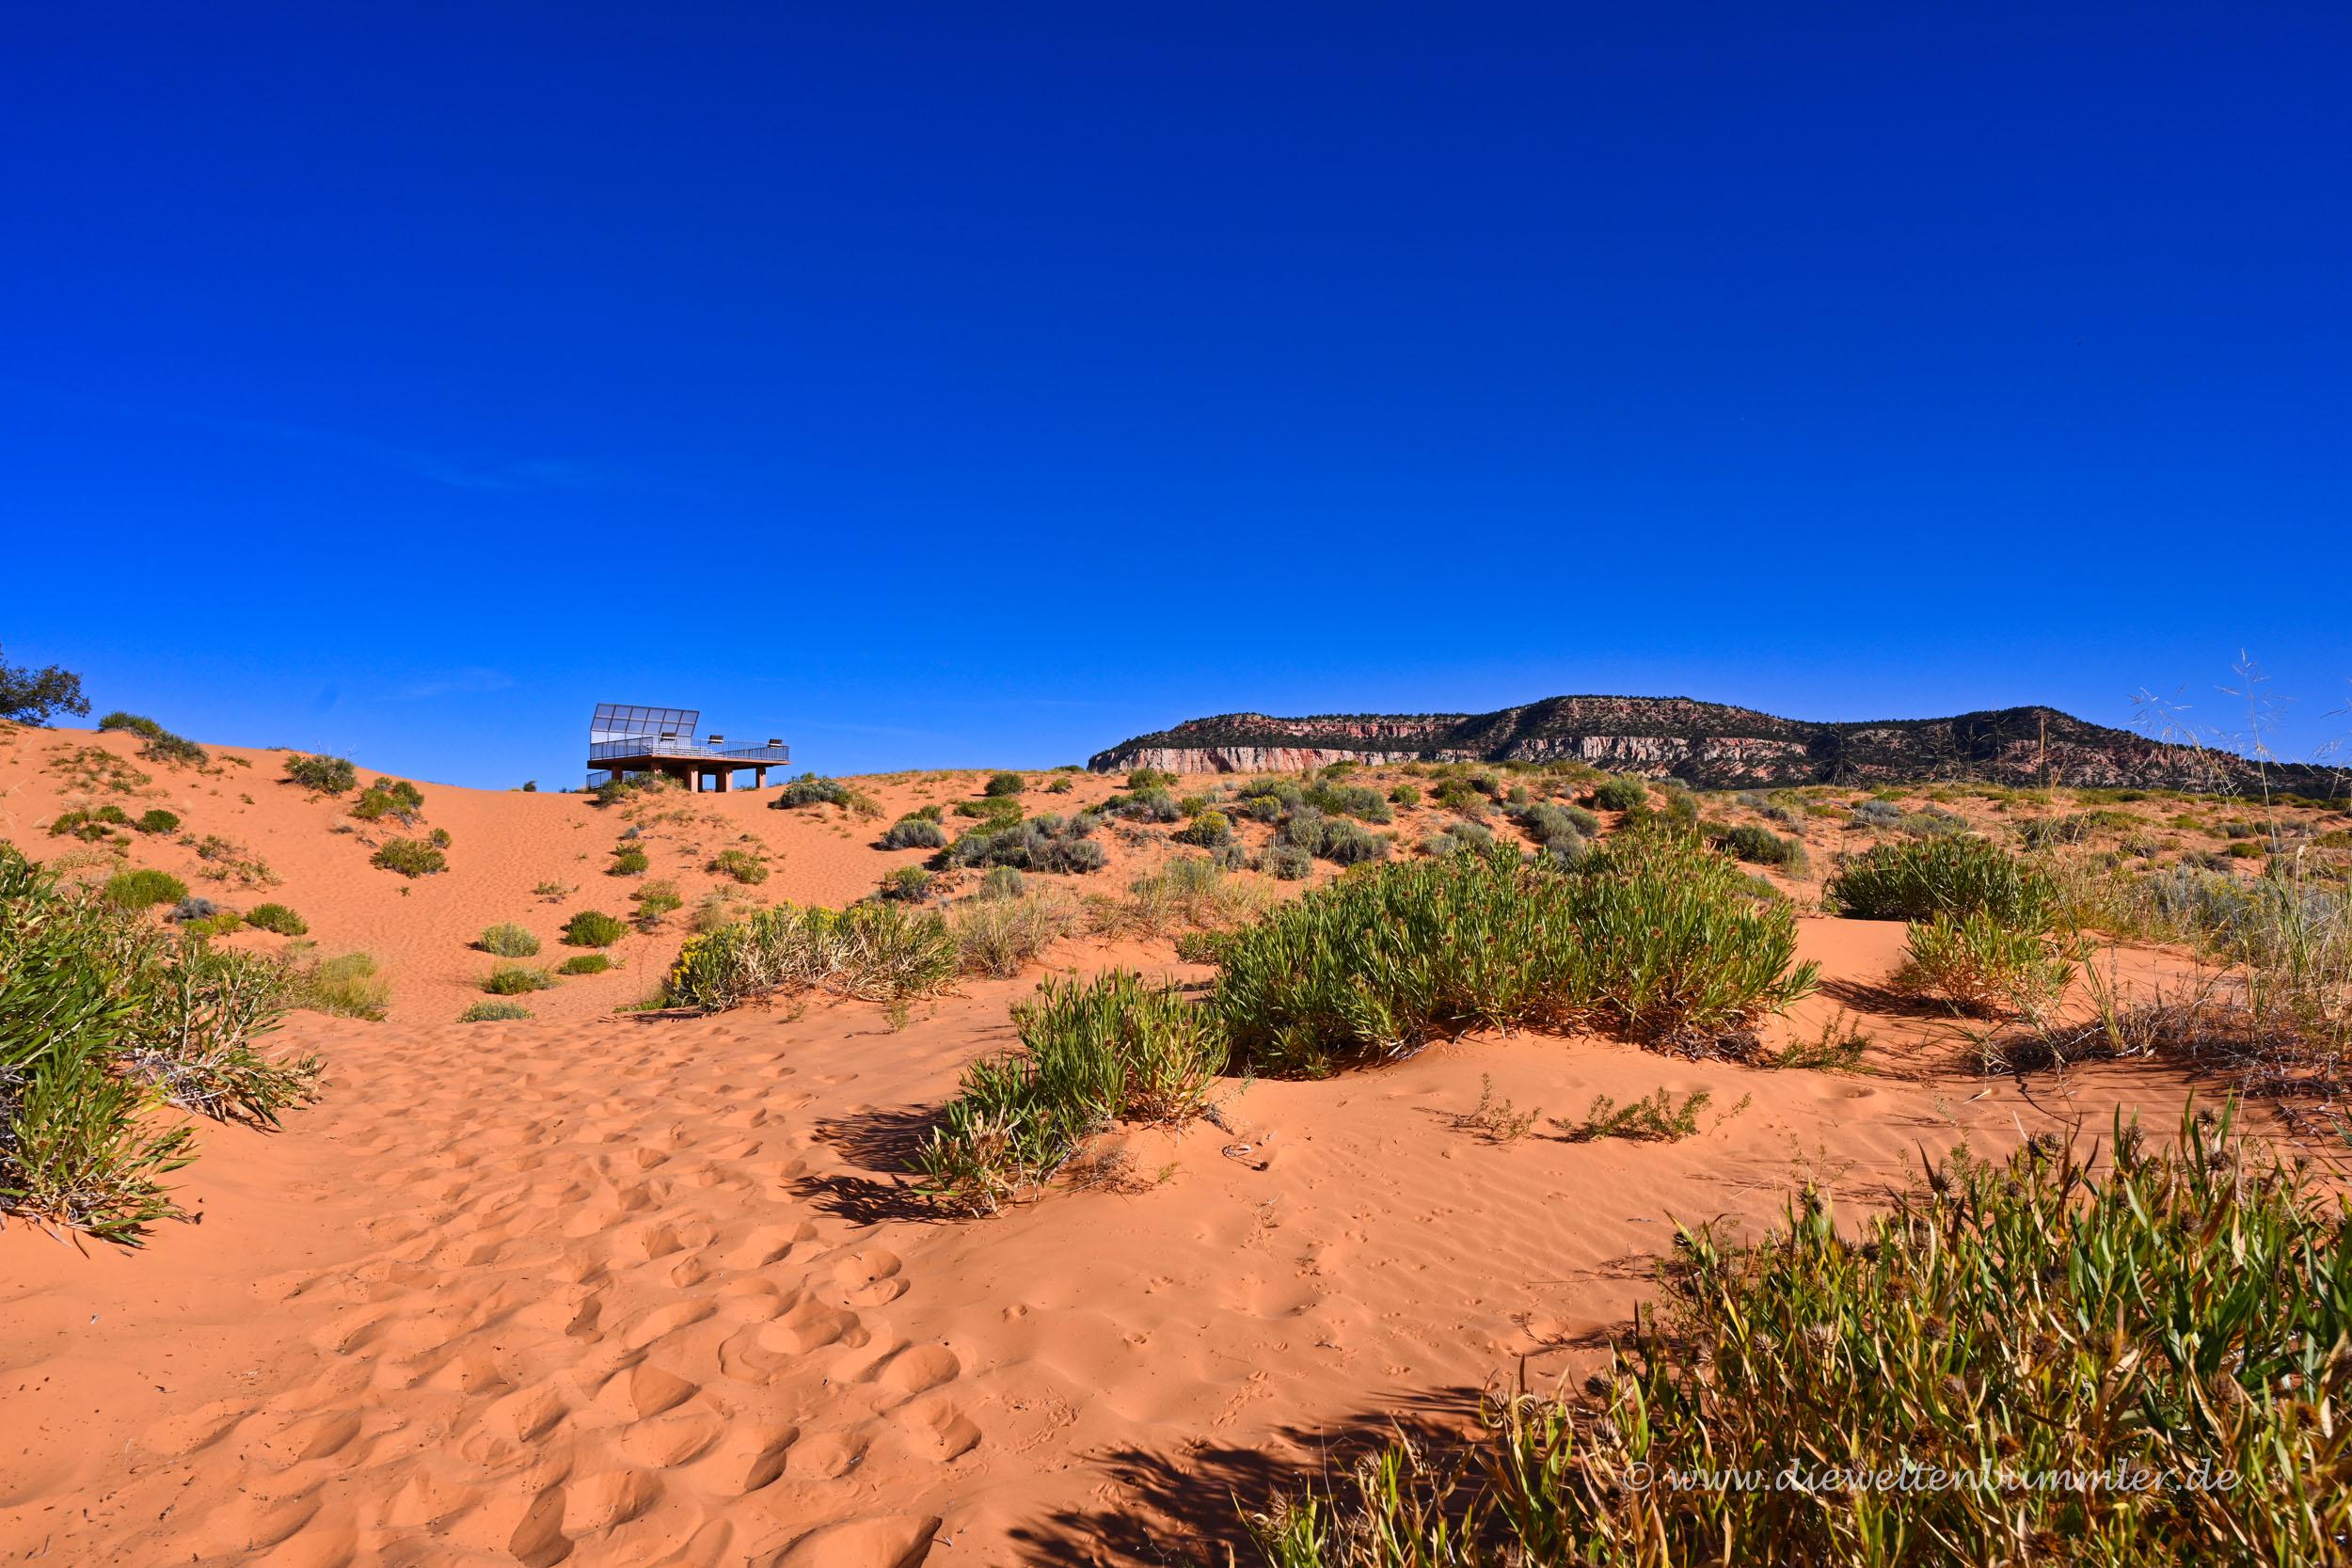 Sandige Landschaft